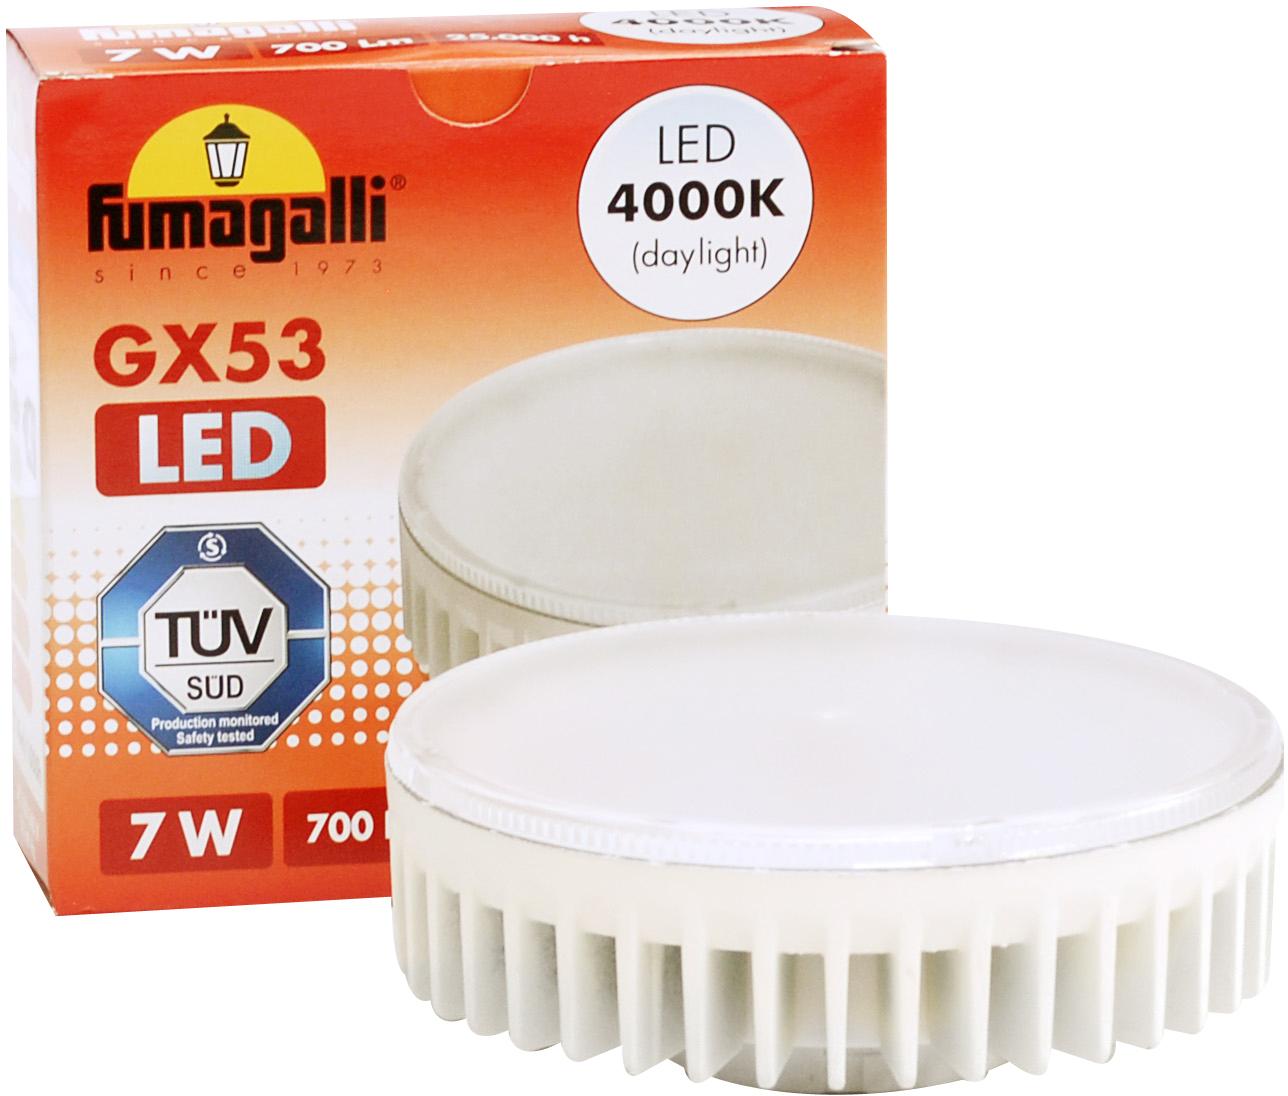 7w gx53 led lamp fumagalli range asbac lighting. Black Bedroom Furniture Sets. Home Design Ideas